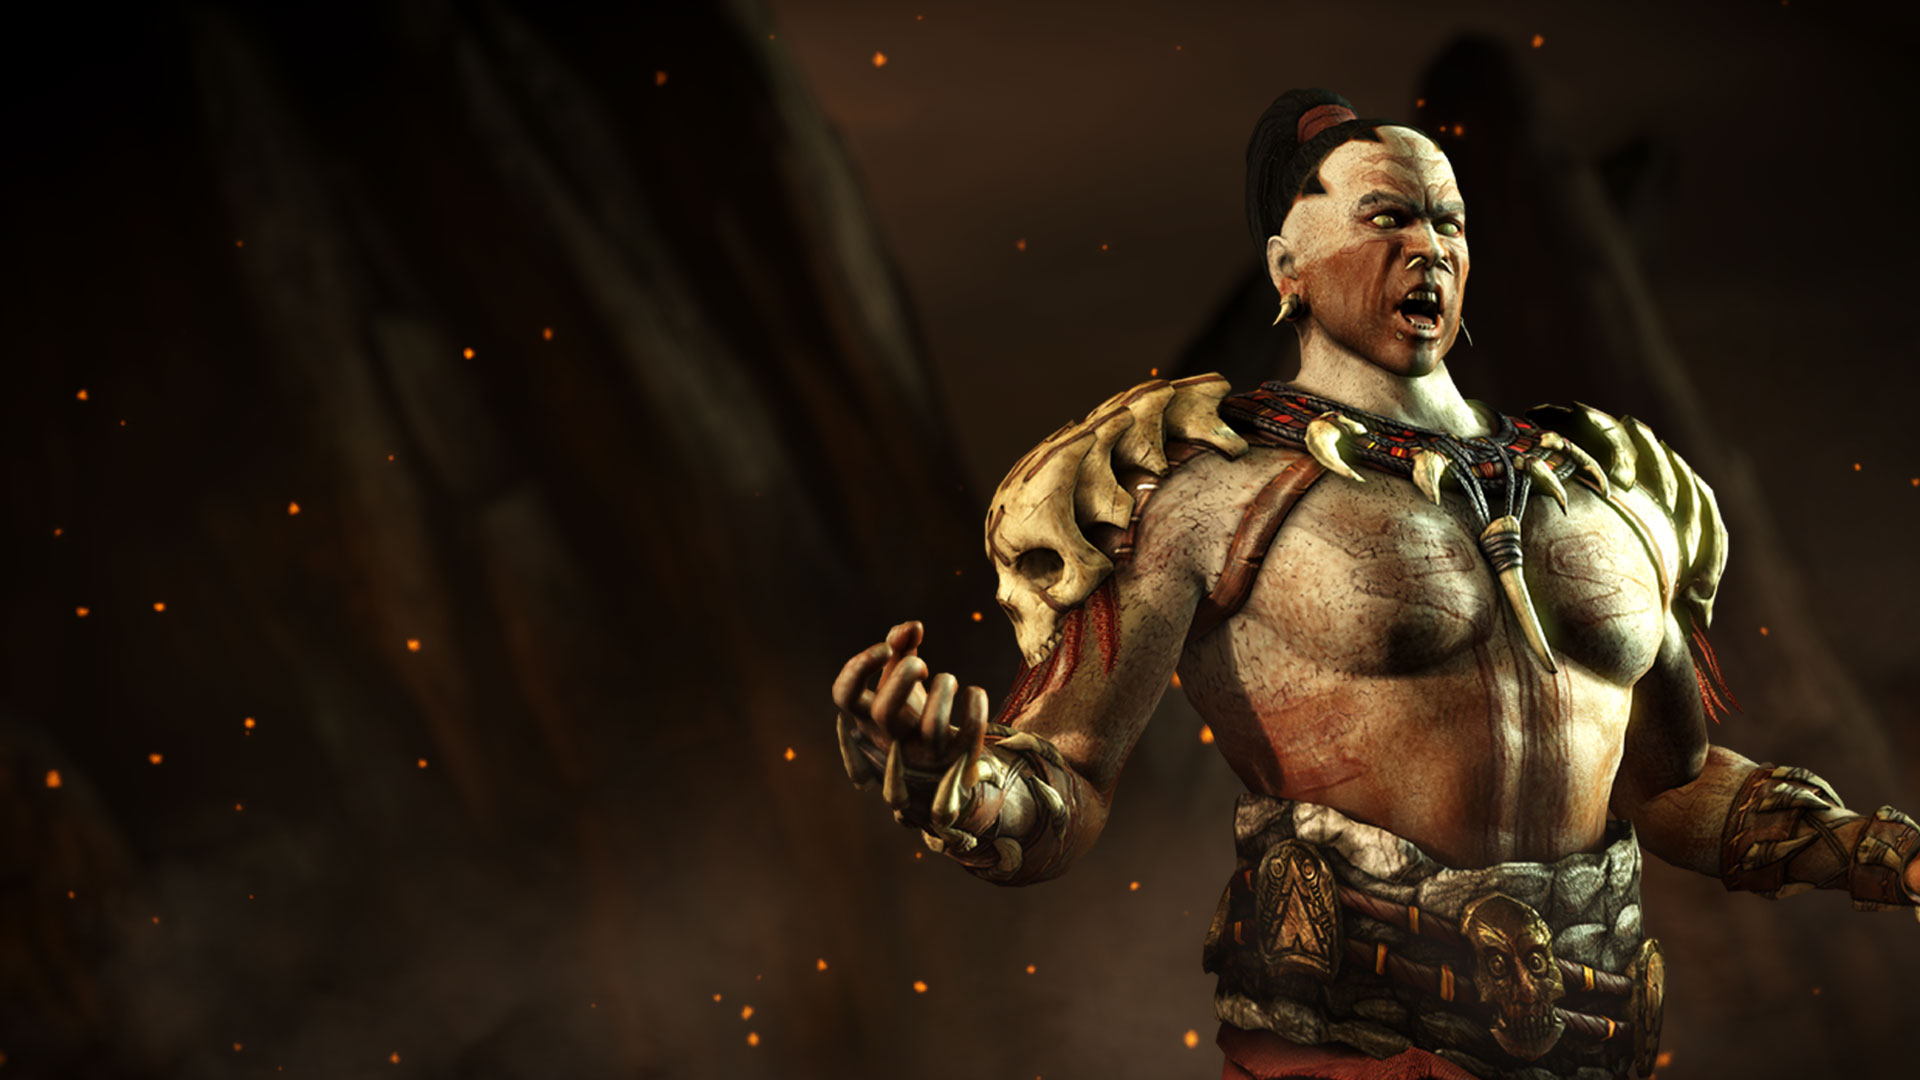 Scorpion Mortal Kombat Hd Wallpaper Mkwarehouse Mortal Kombat X Kotal Kahn